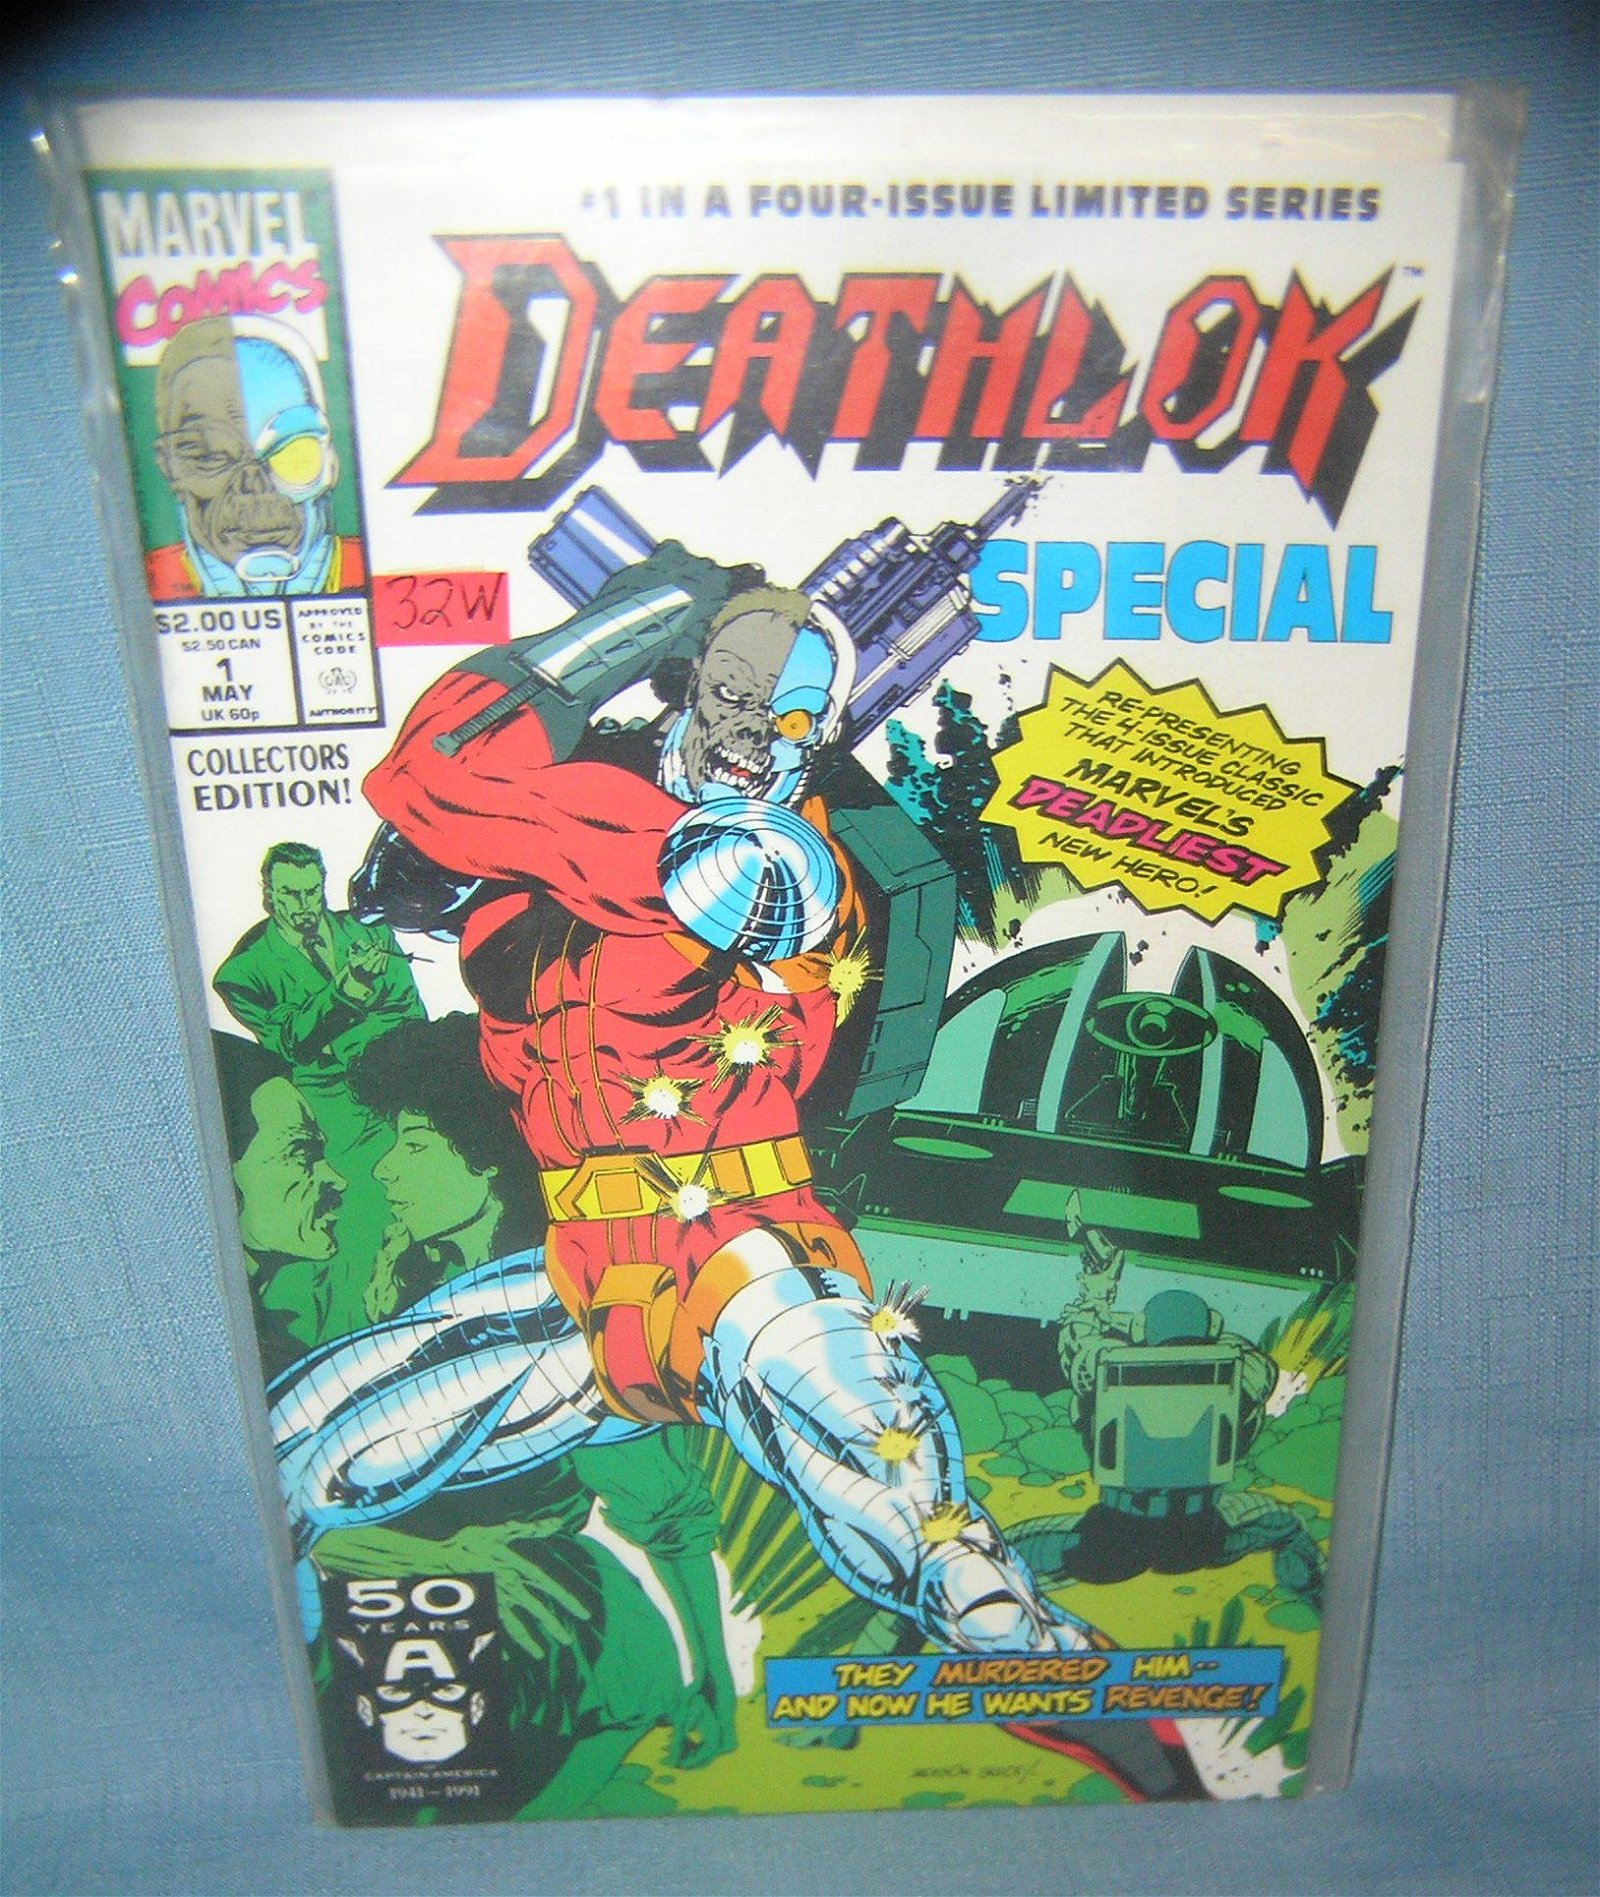 Deathlok first edition special comic book